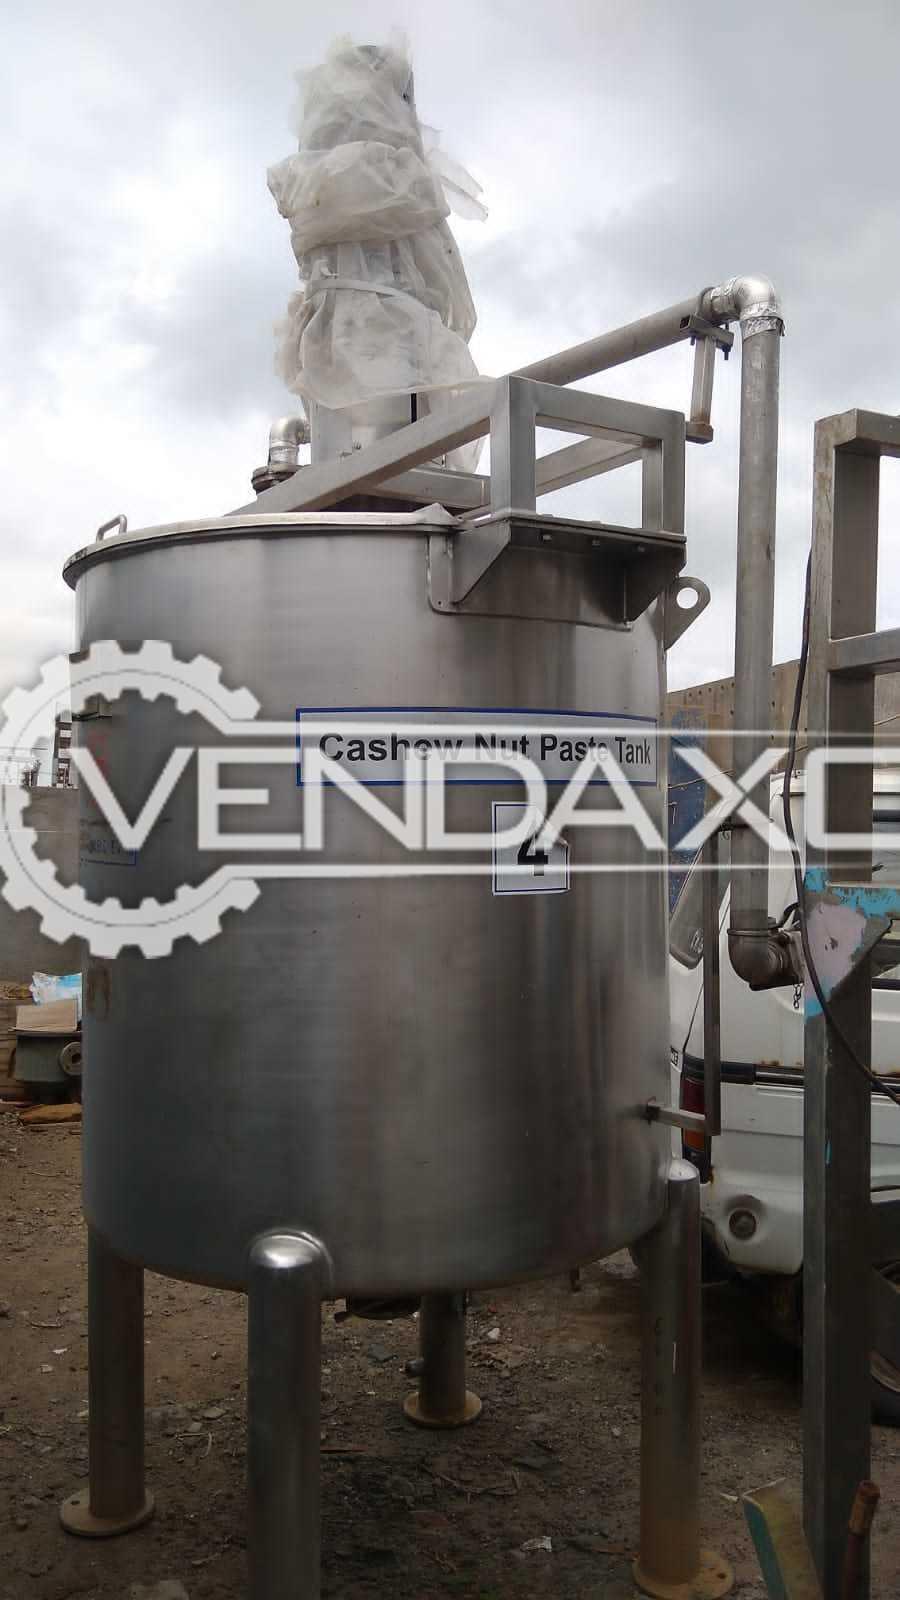 Dharma Engineering SS Cashew Nut Paste Mixing Tank - 1300 Liter, 2016 Model